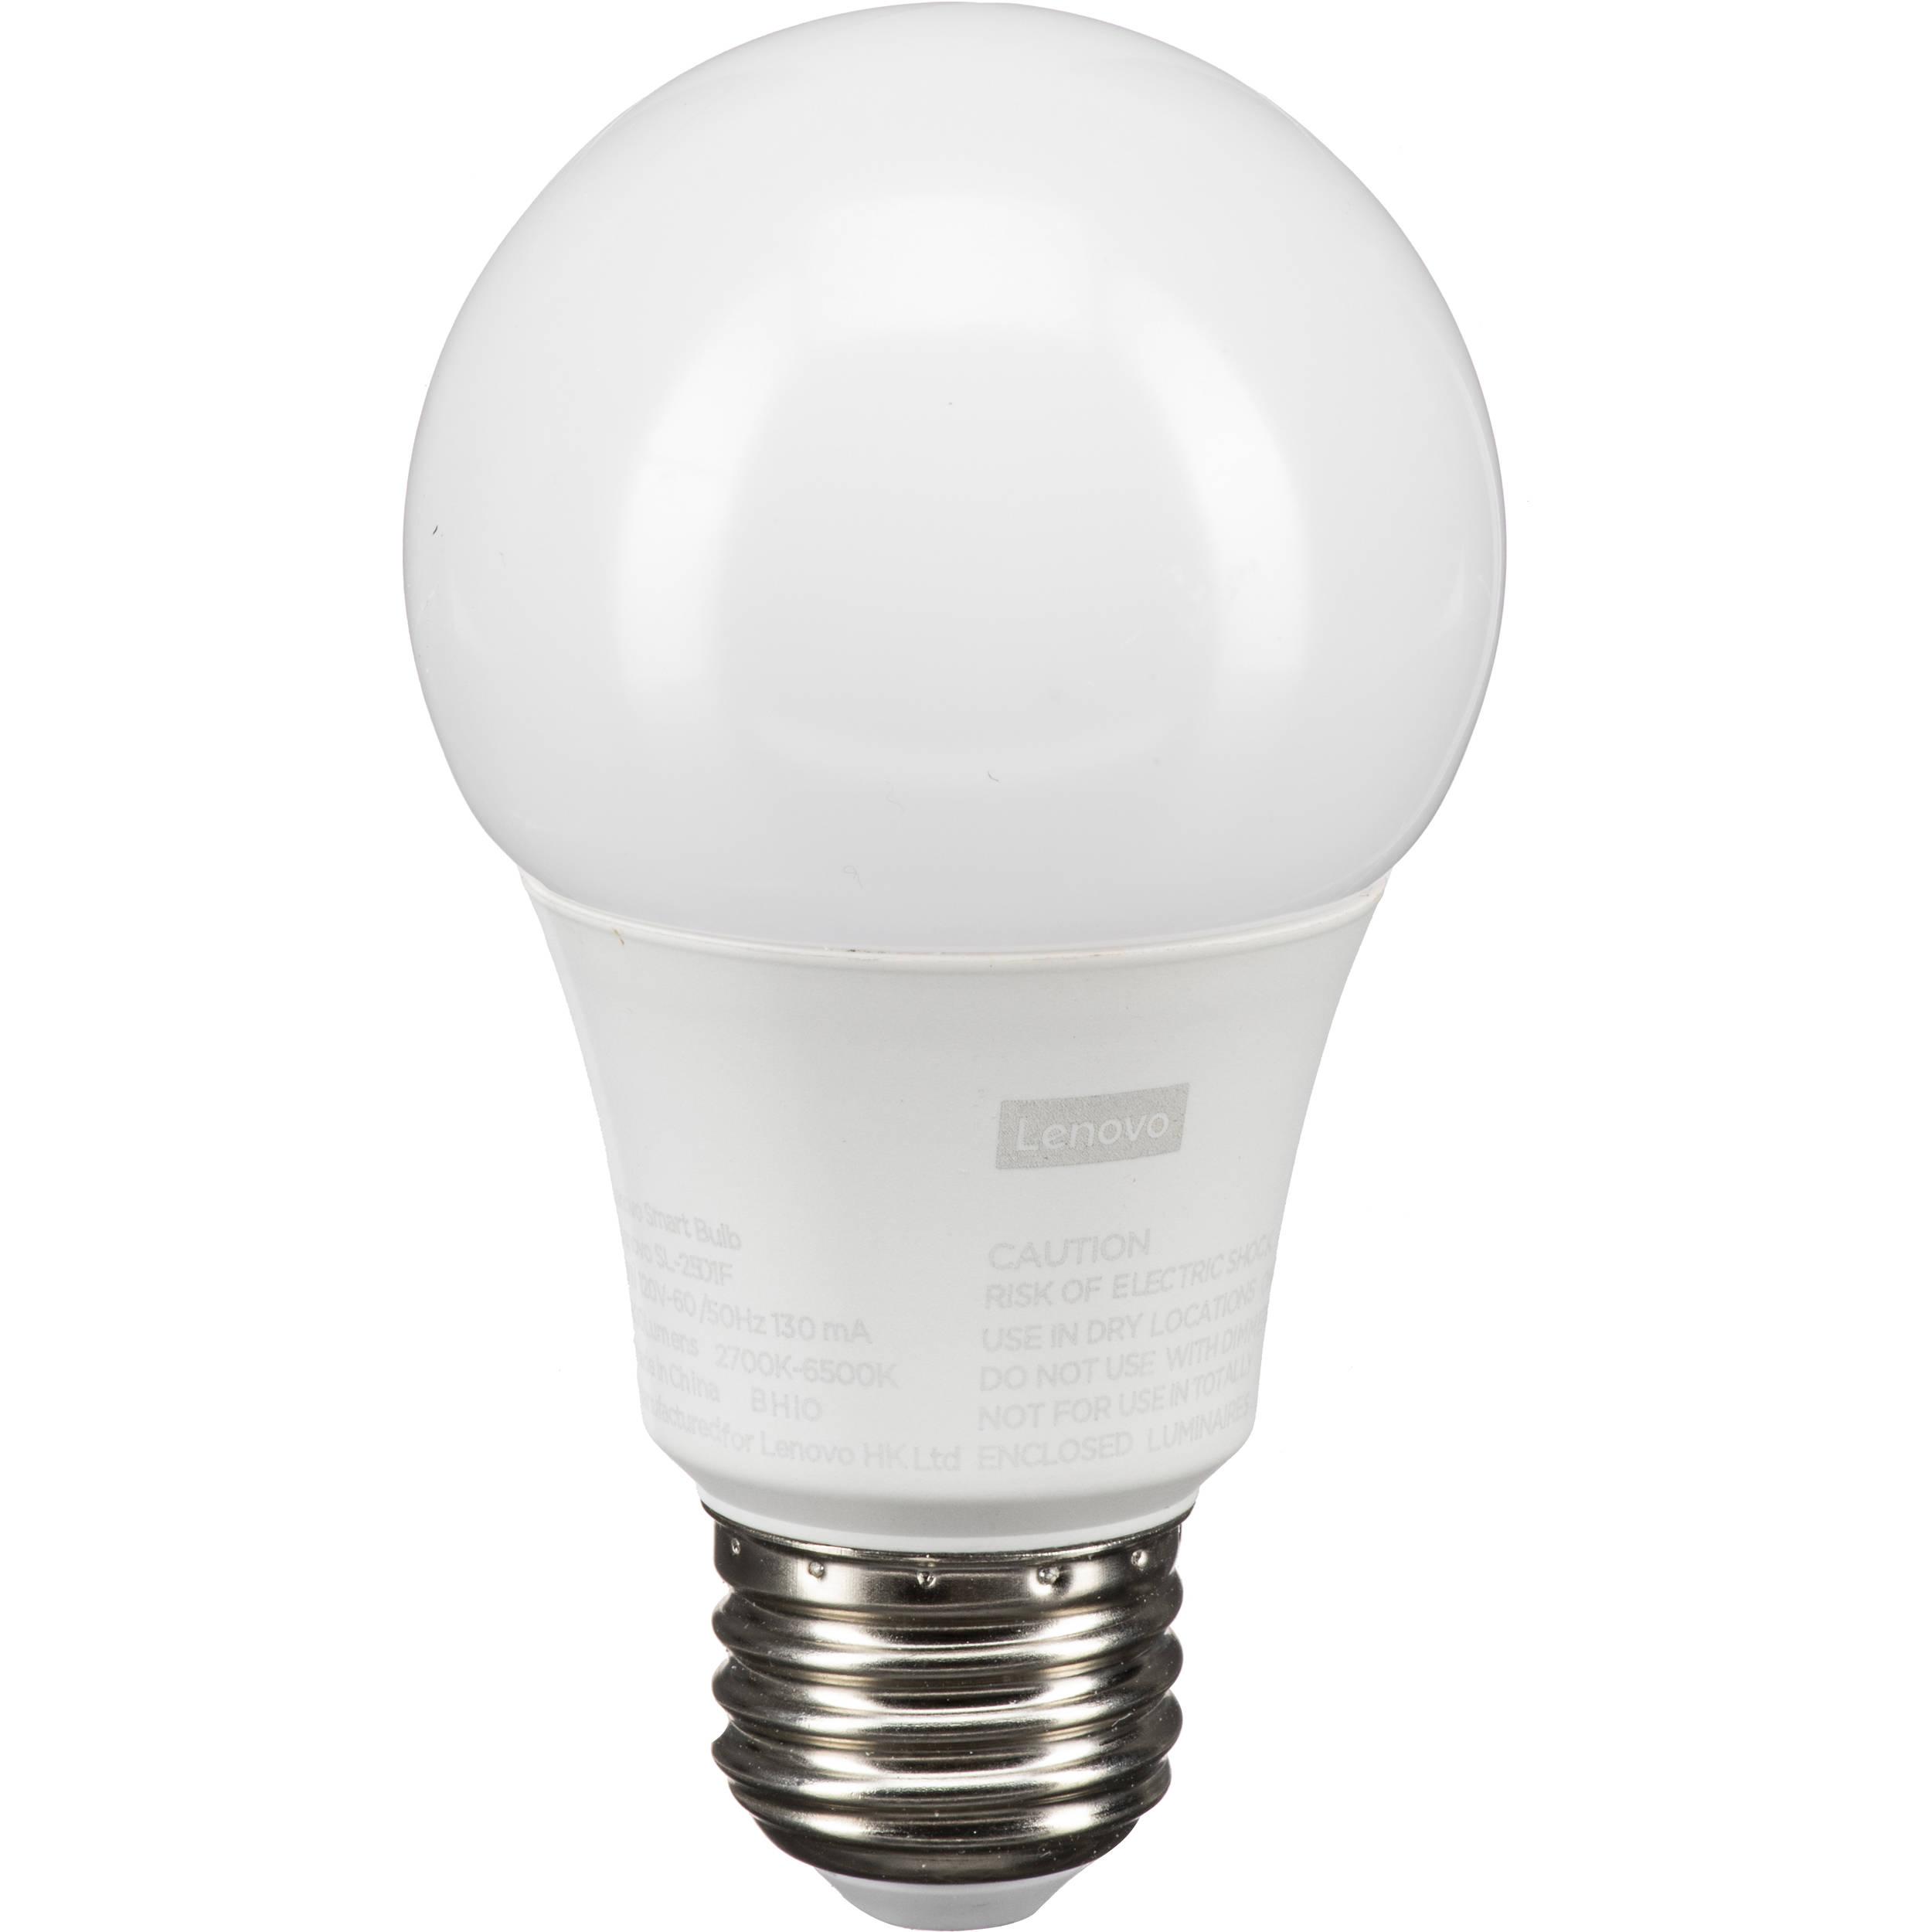 lenovo wi fi smart bulb white zg38c02546 b h photo video. Black Bedroom Furniture Sets. Home Design Ideas